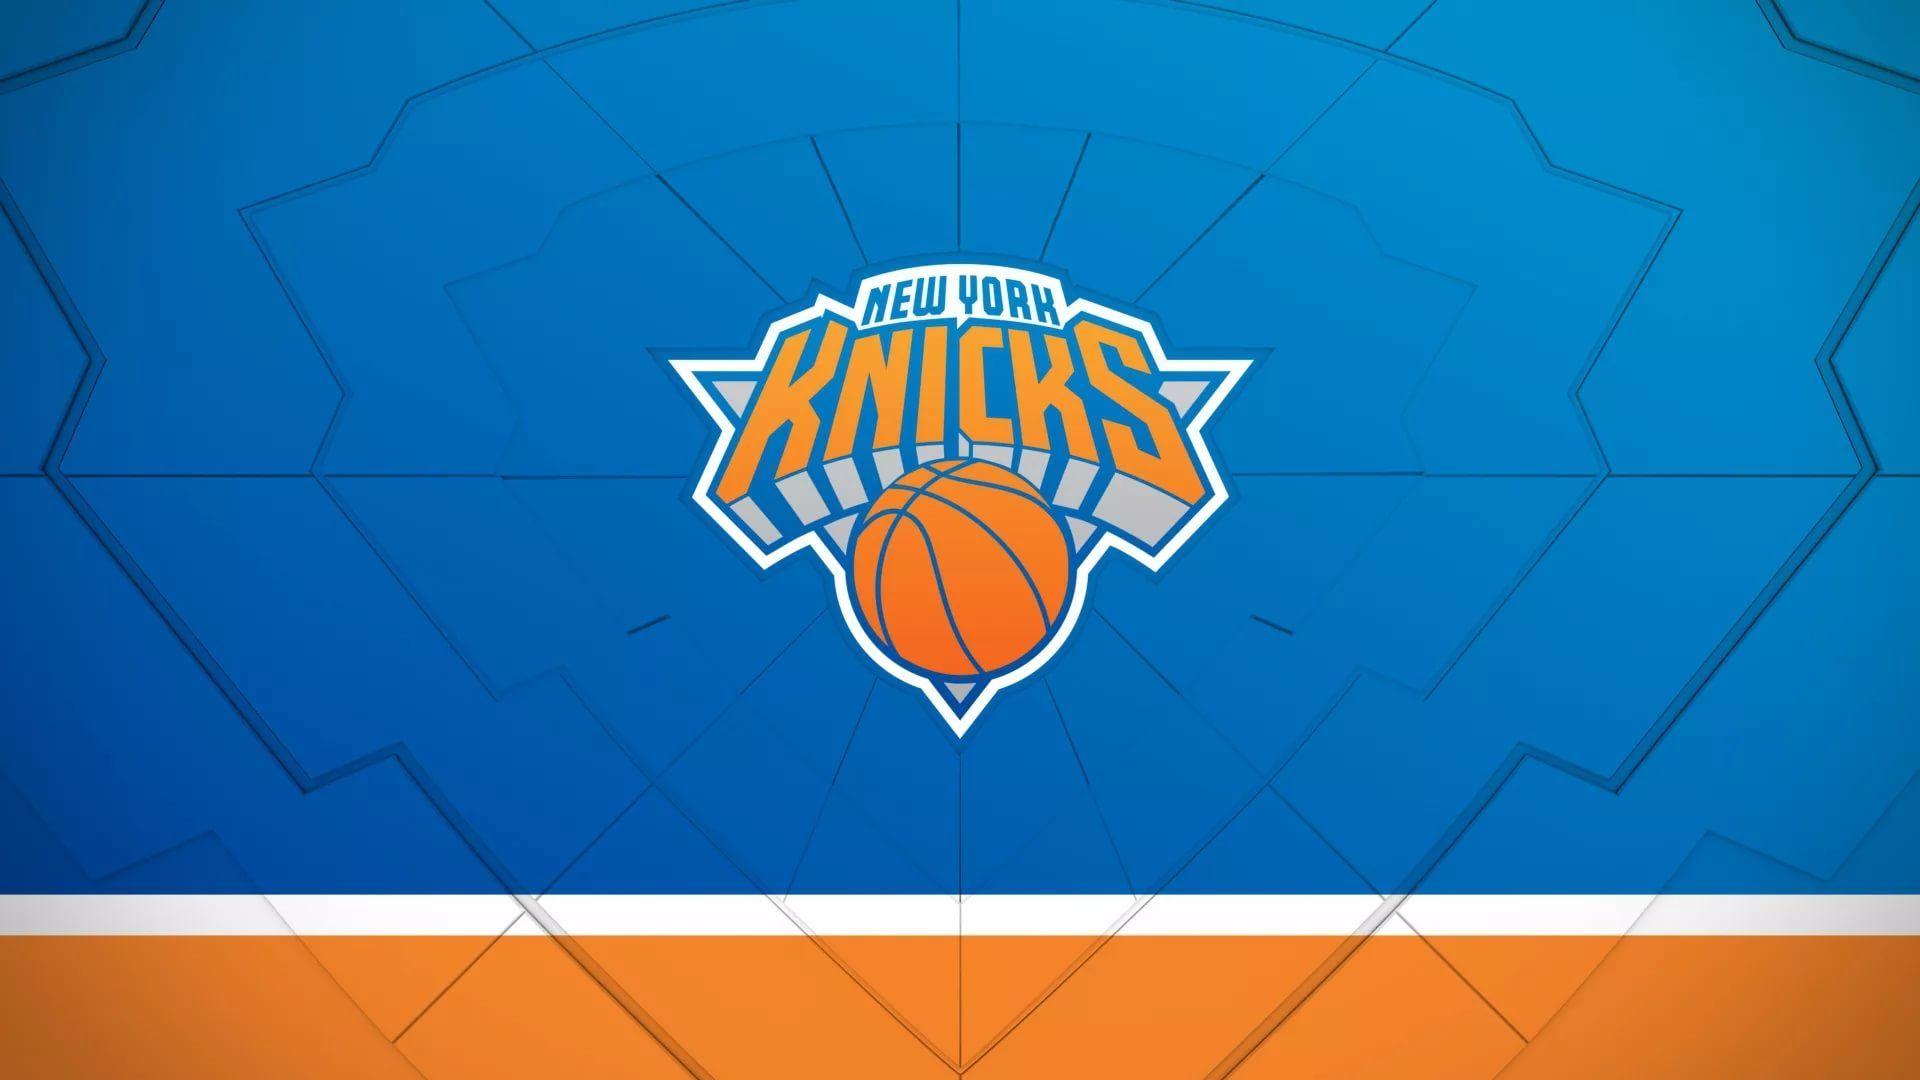 New York Knicks Download Wallpaper